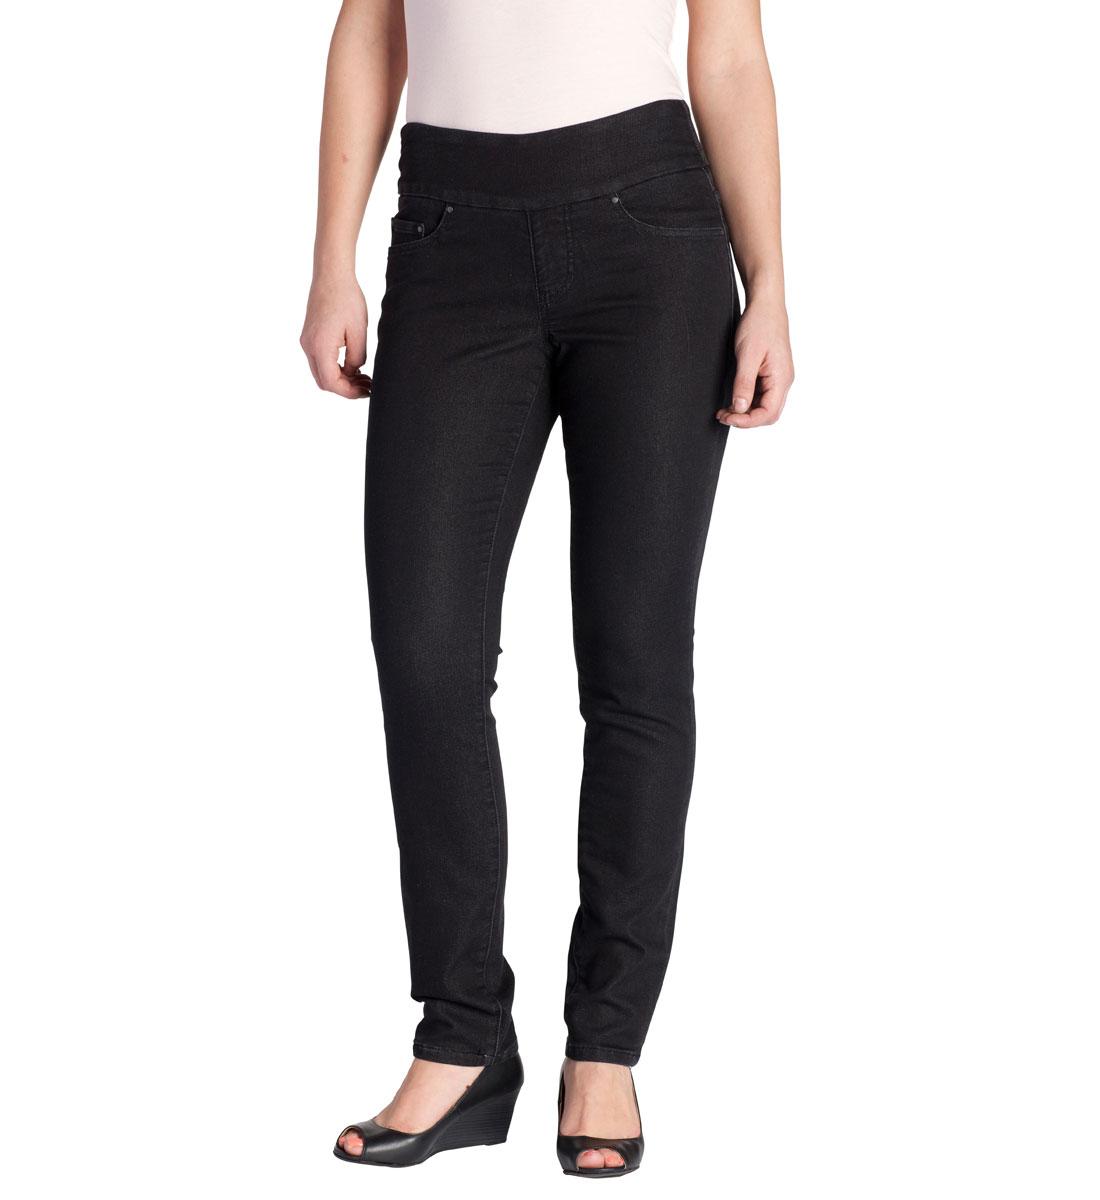 4d22719a9b1 Nora Skinny Jeans Black